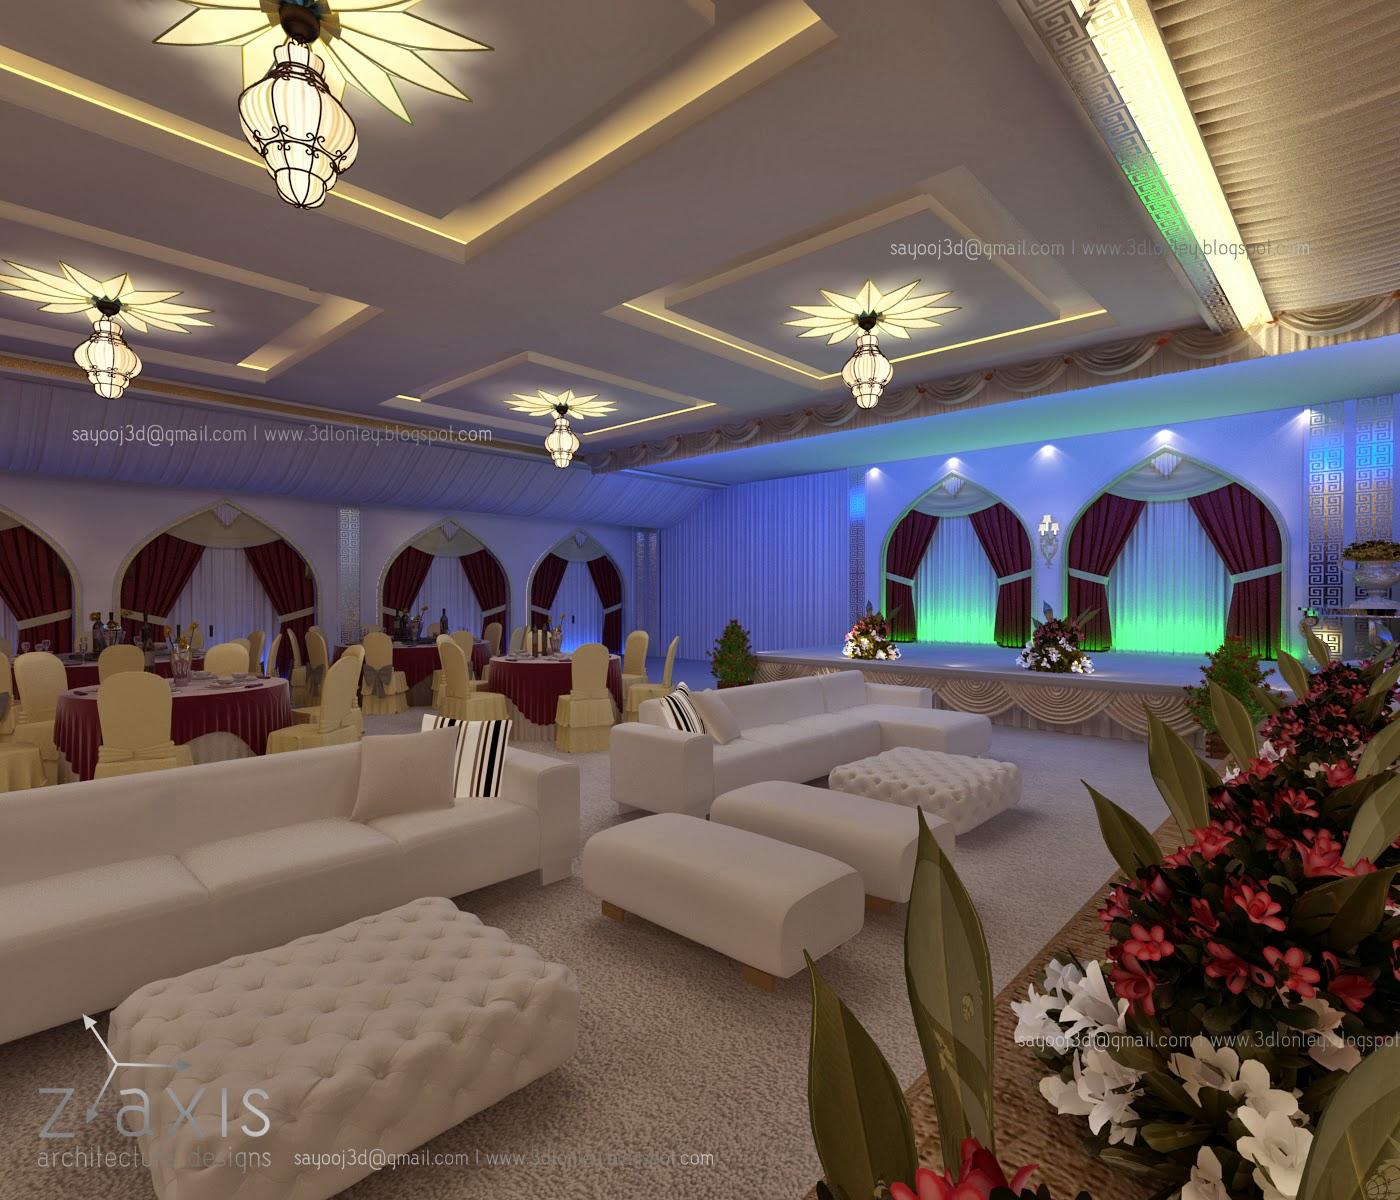 Banquet Hall Design: House Plans And Design: Architectural Designs Wedding Halls